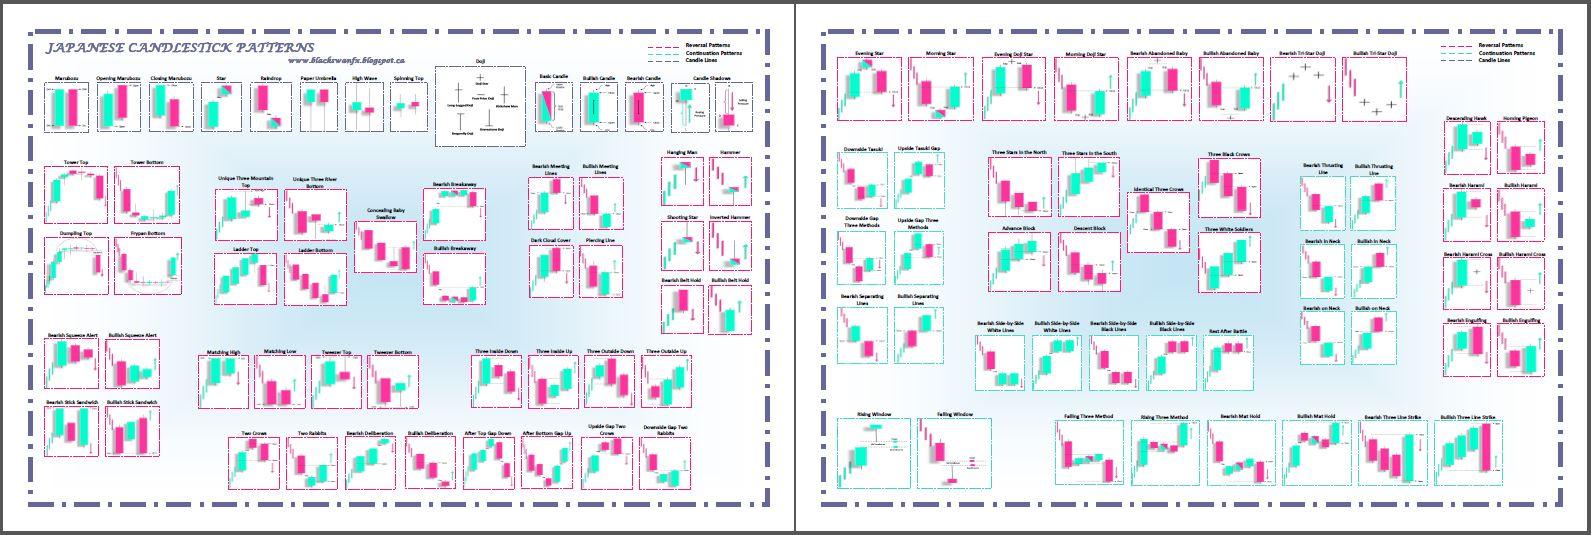 bináris opciók bónuszok listája